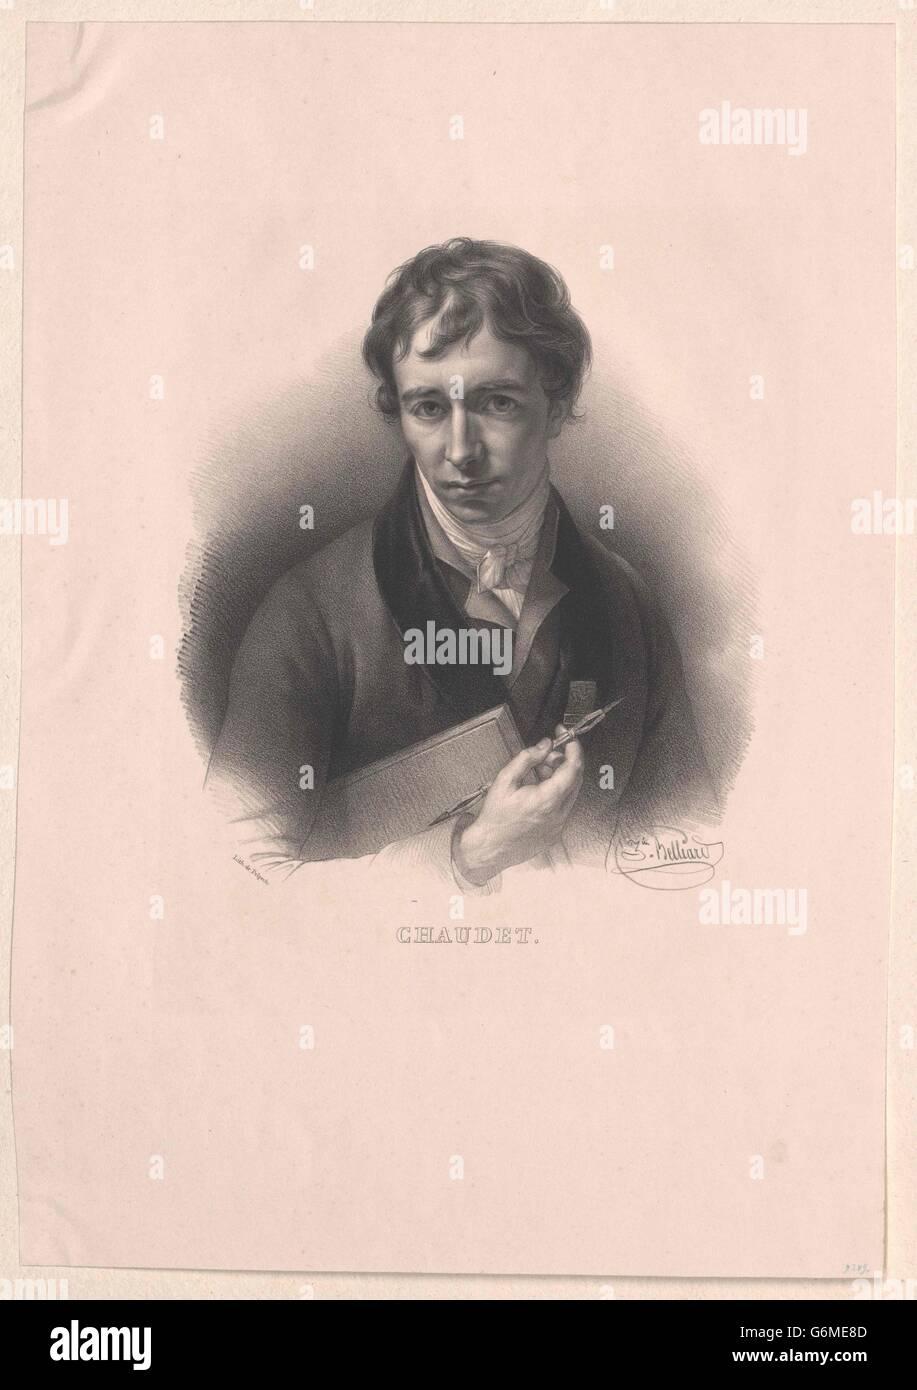 Chaudet, Antoine-Denis - Stock Image